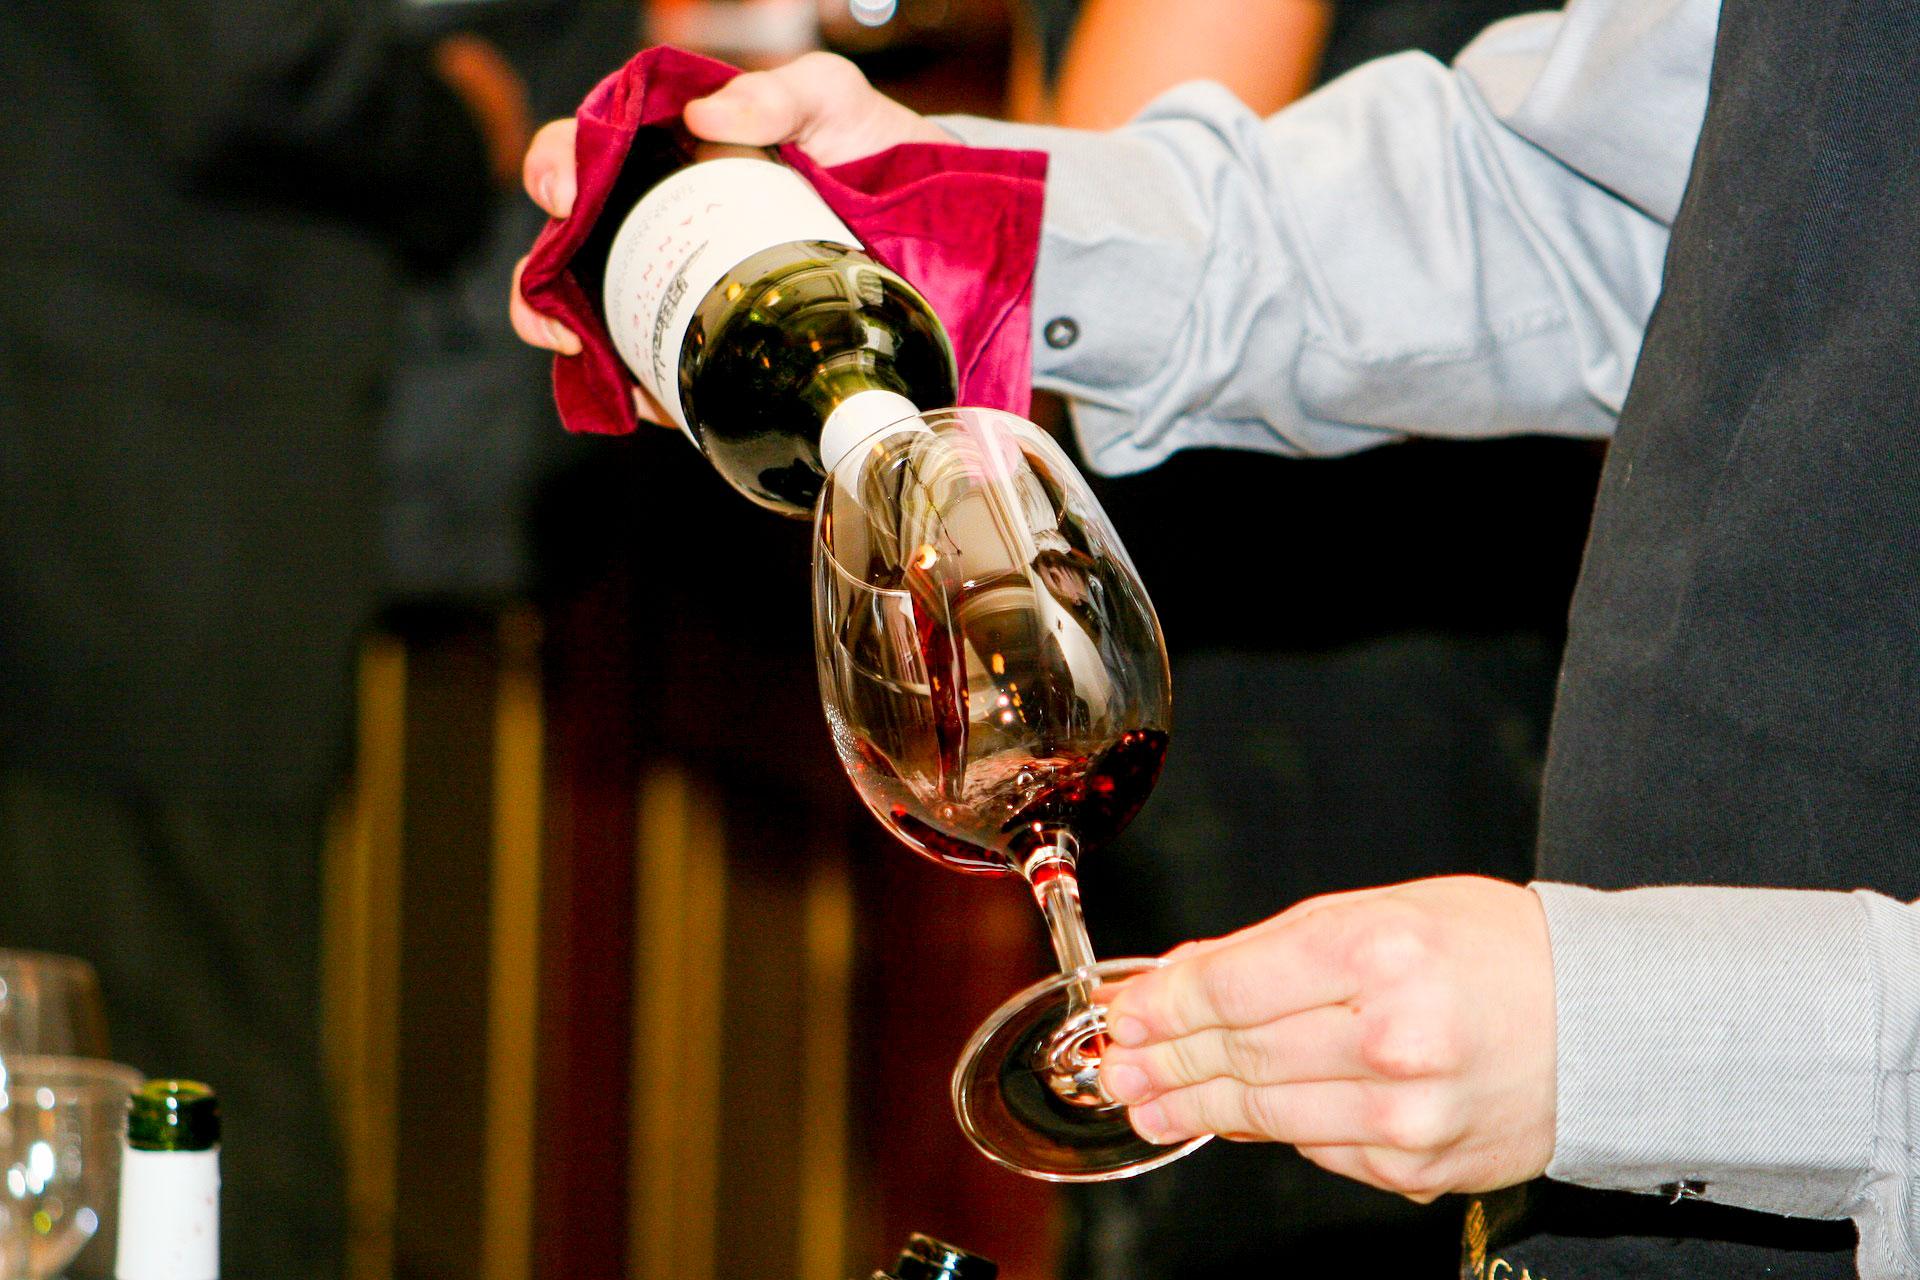 Wi-bev, vino, verona, fiere, beverage, technologies, vin, beverage, technologies